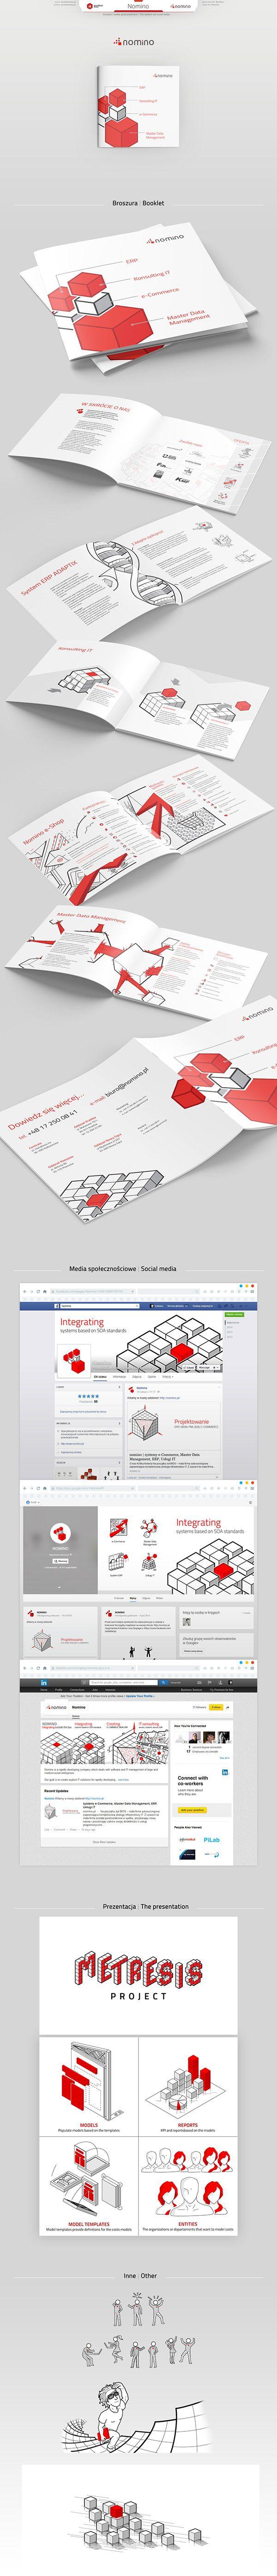 Nomino #illustration, #lineart, #corporateidentity, #leaflet, #website, #drowings